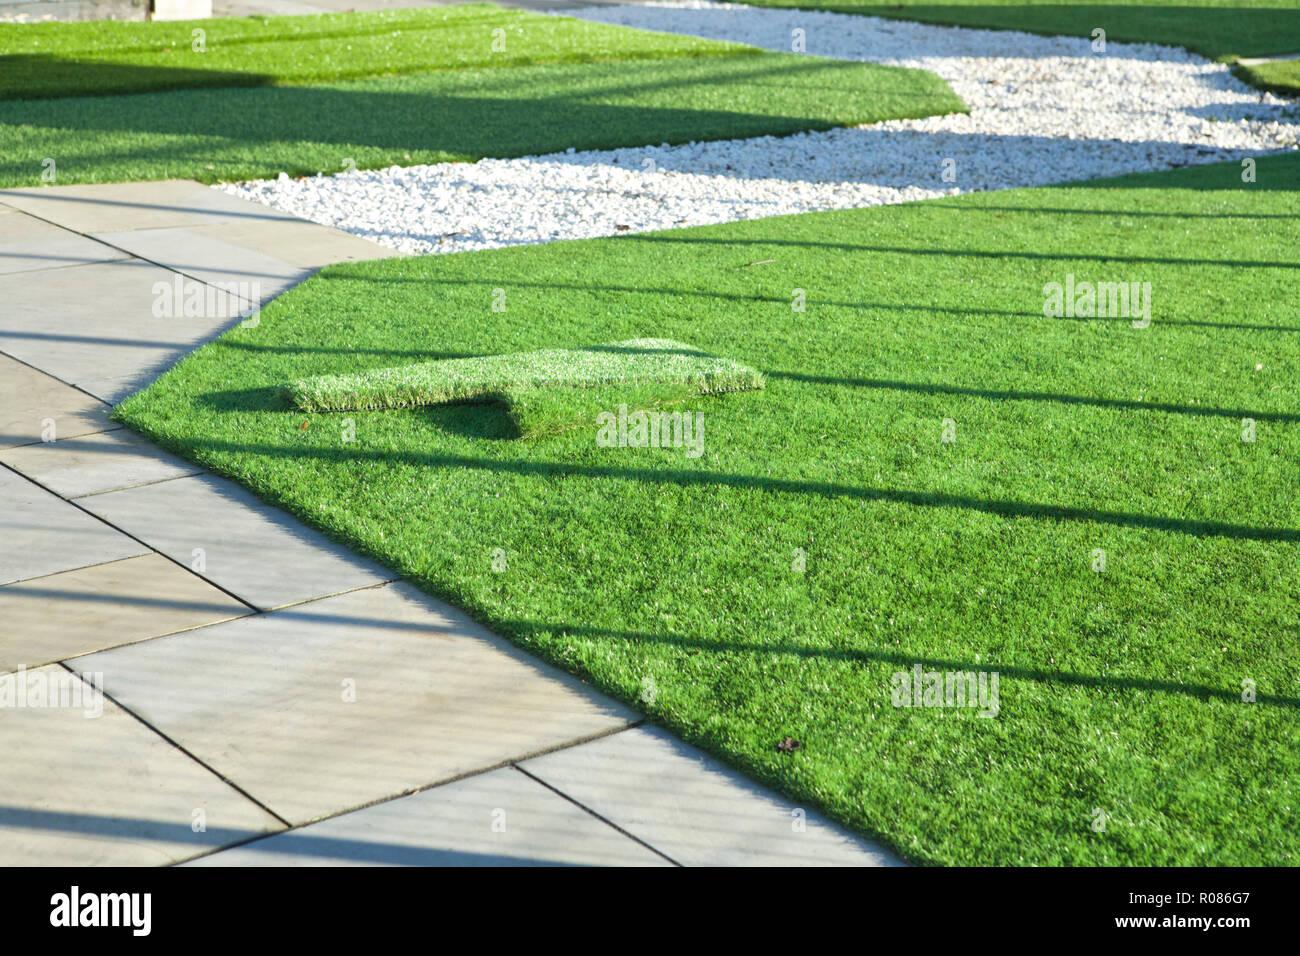 Artificial lawn garden. Artificial grass, artificial lawn UK. - Stock Image